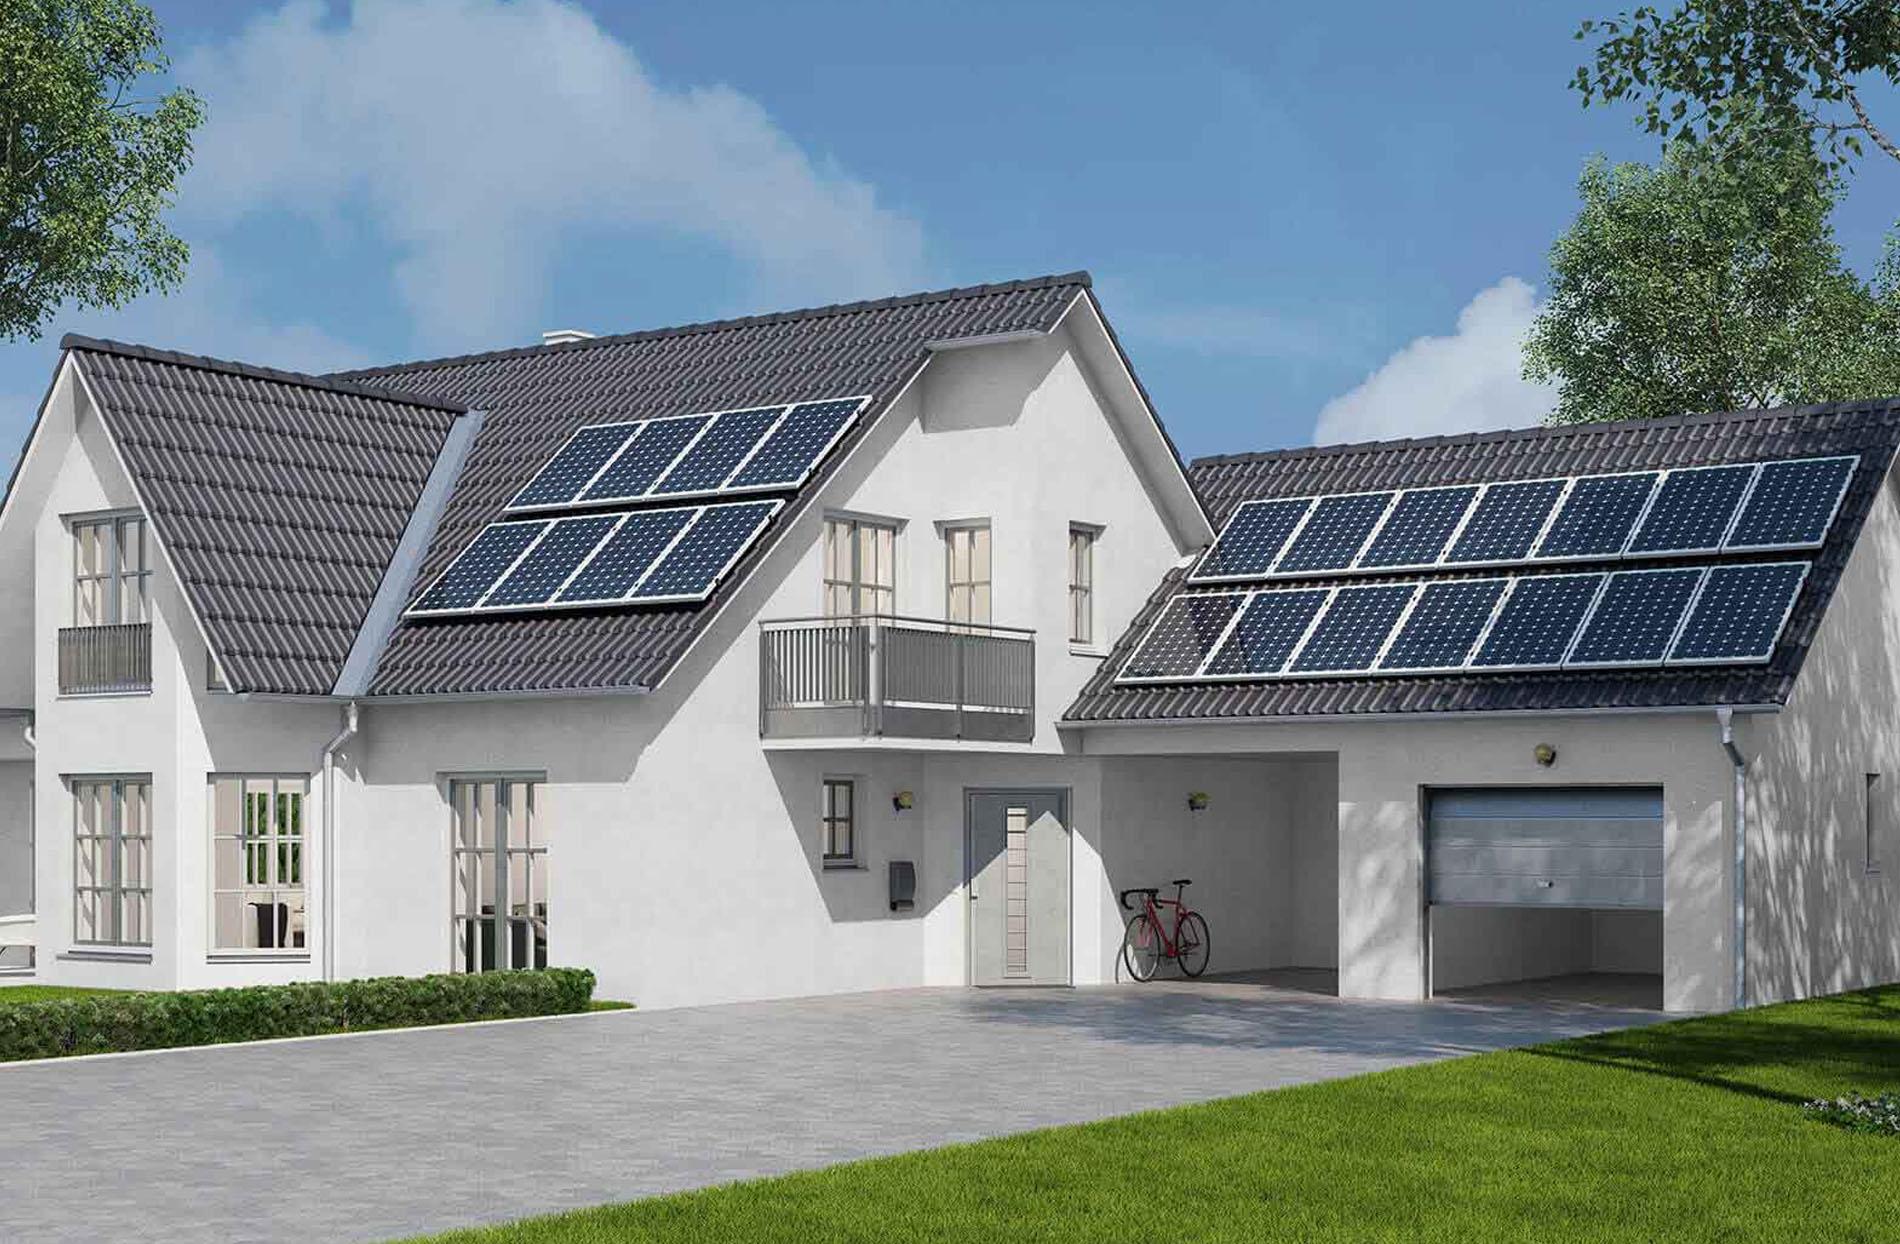 Alles over zonnepanelen | Vincenergy